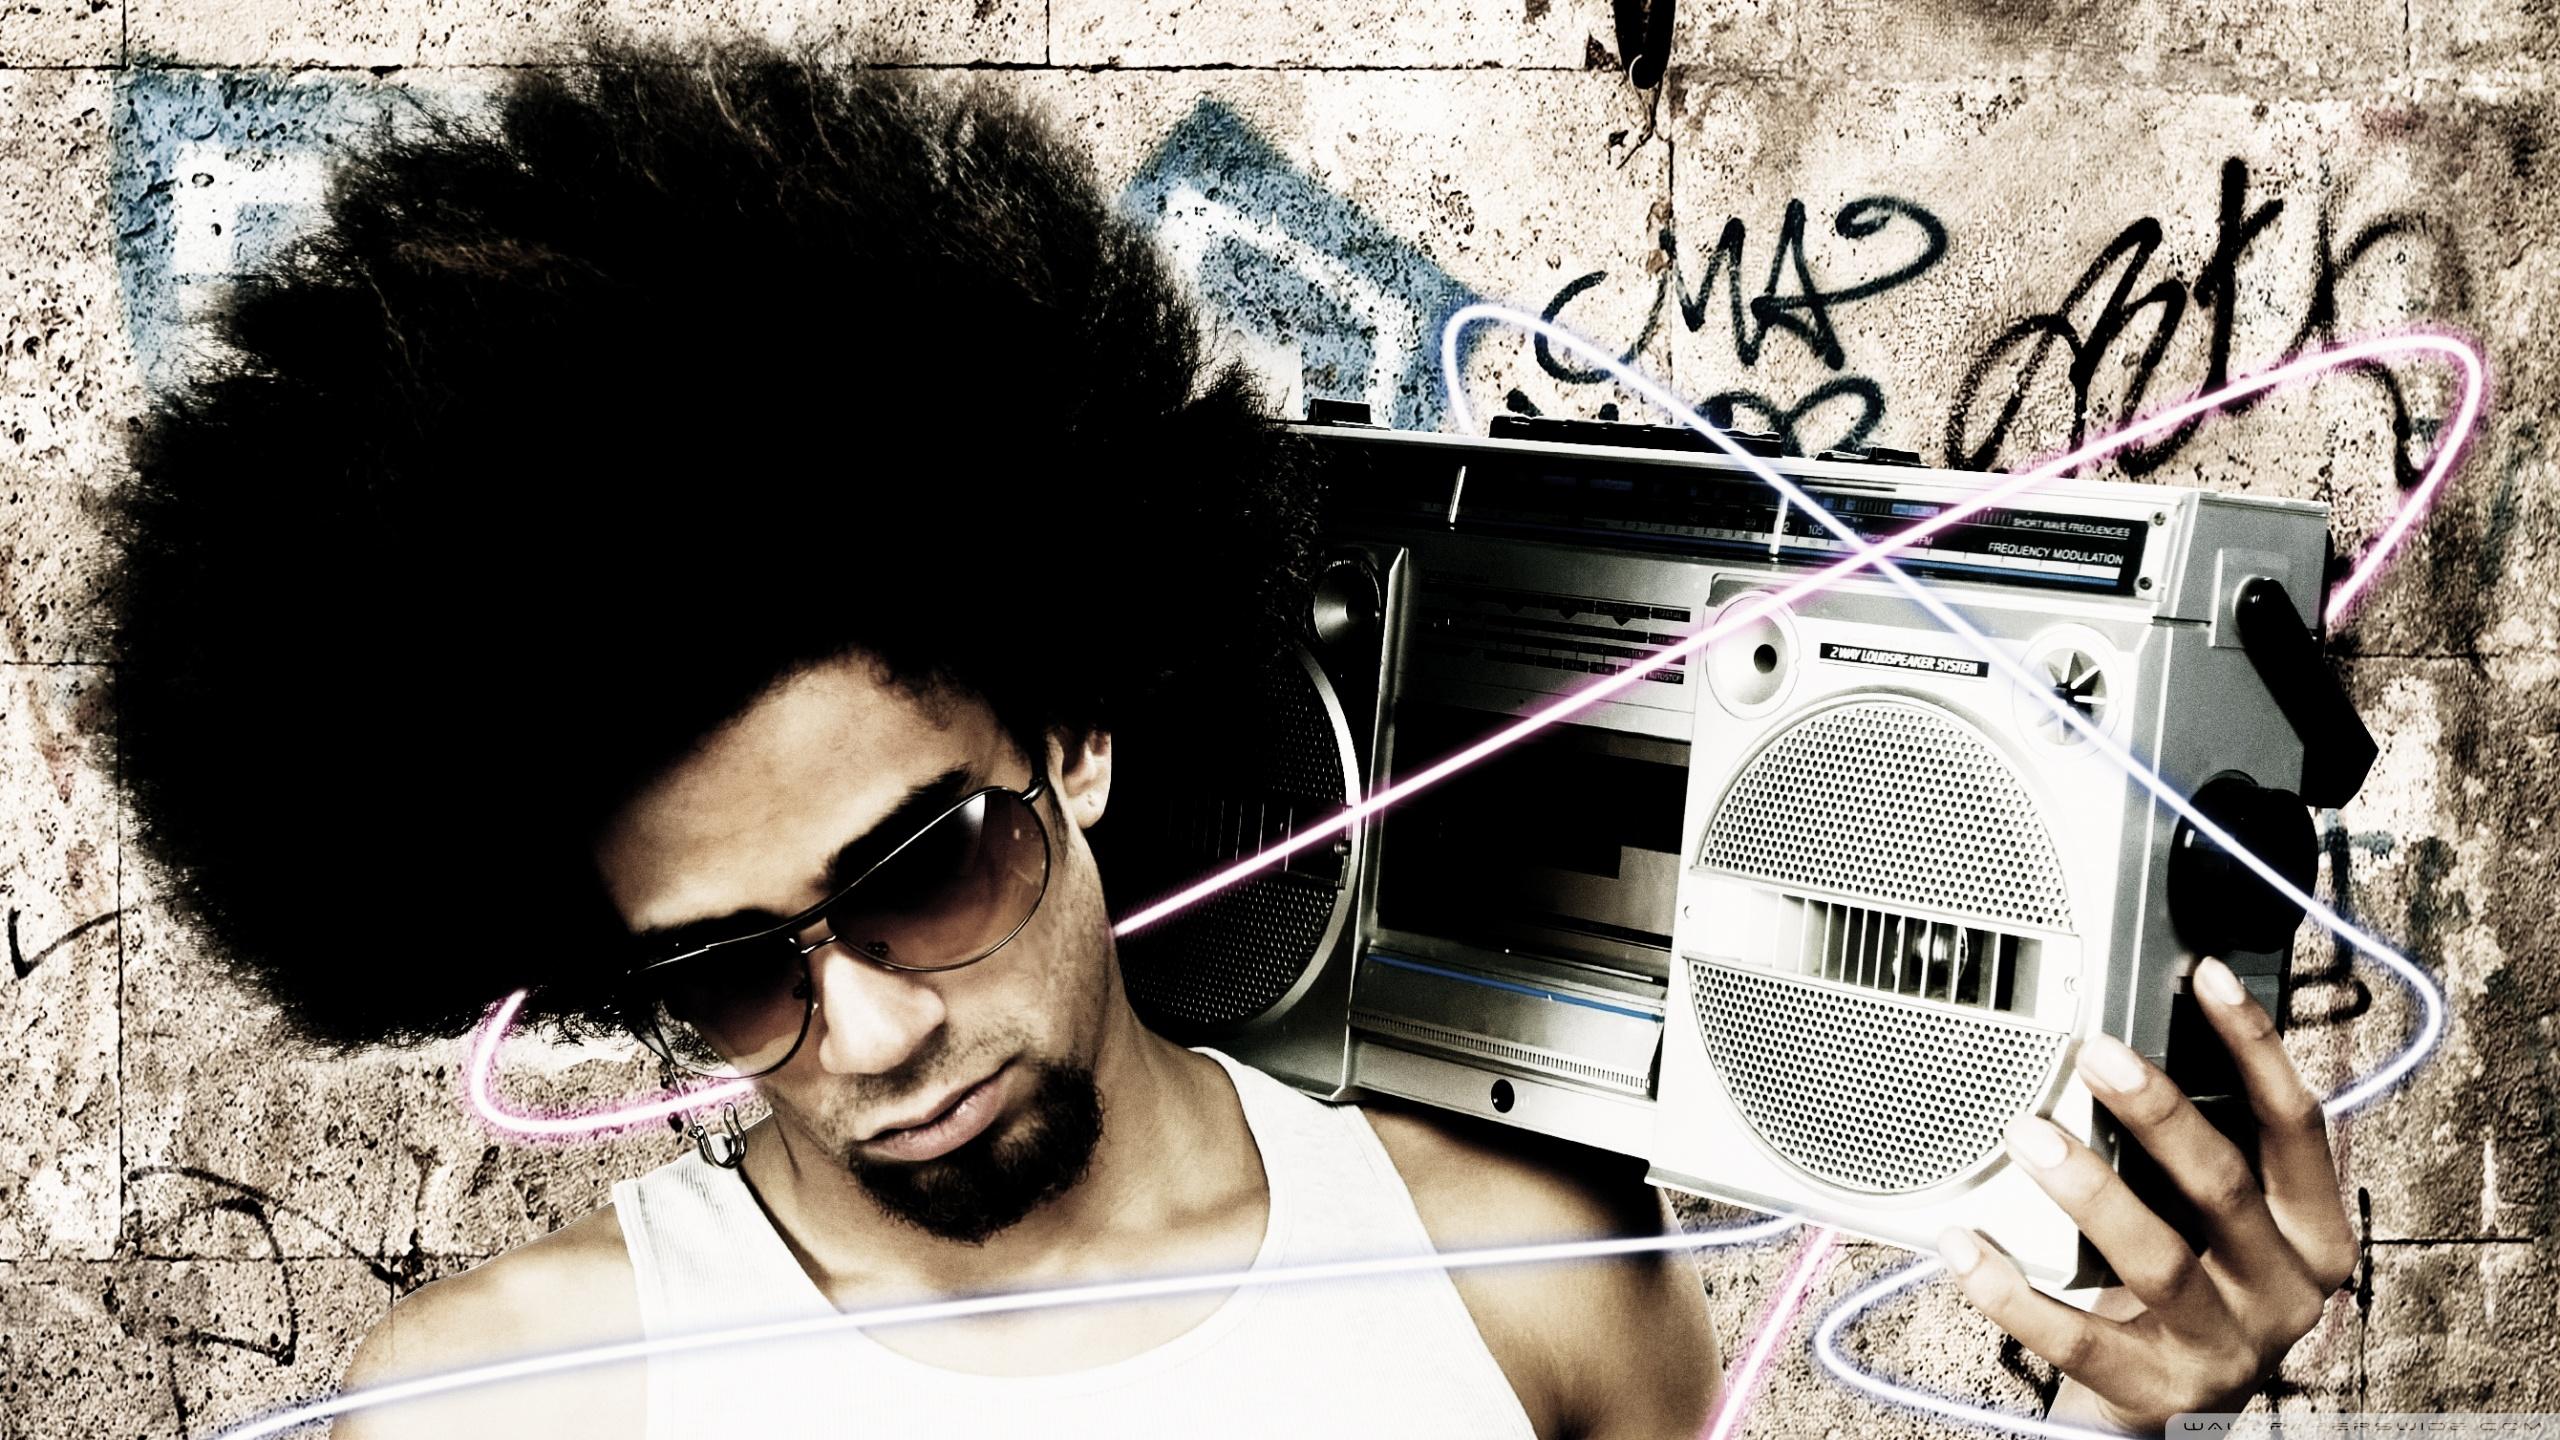 live sound wallpaper 2560x1440 2560x1440